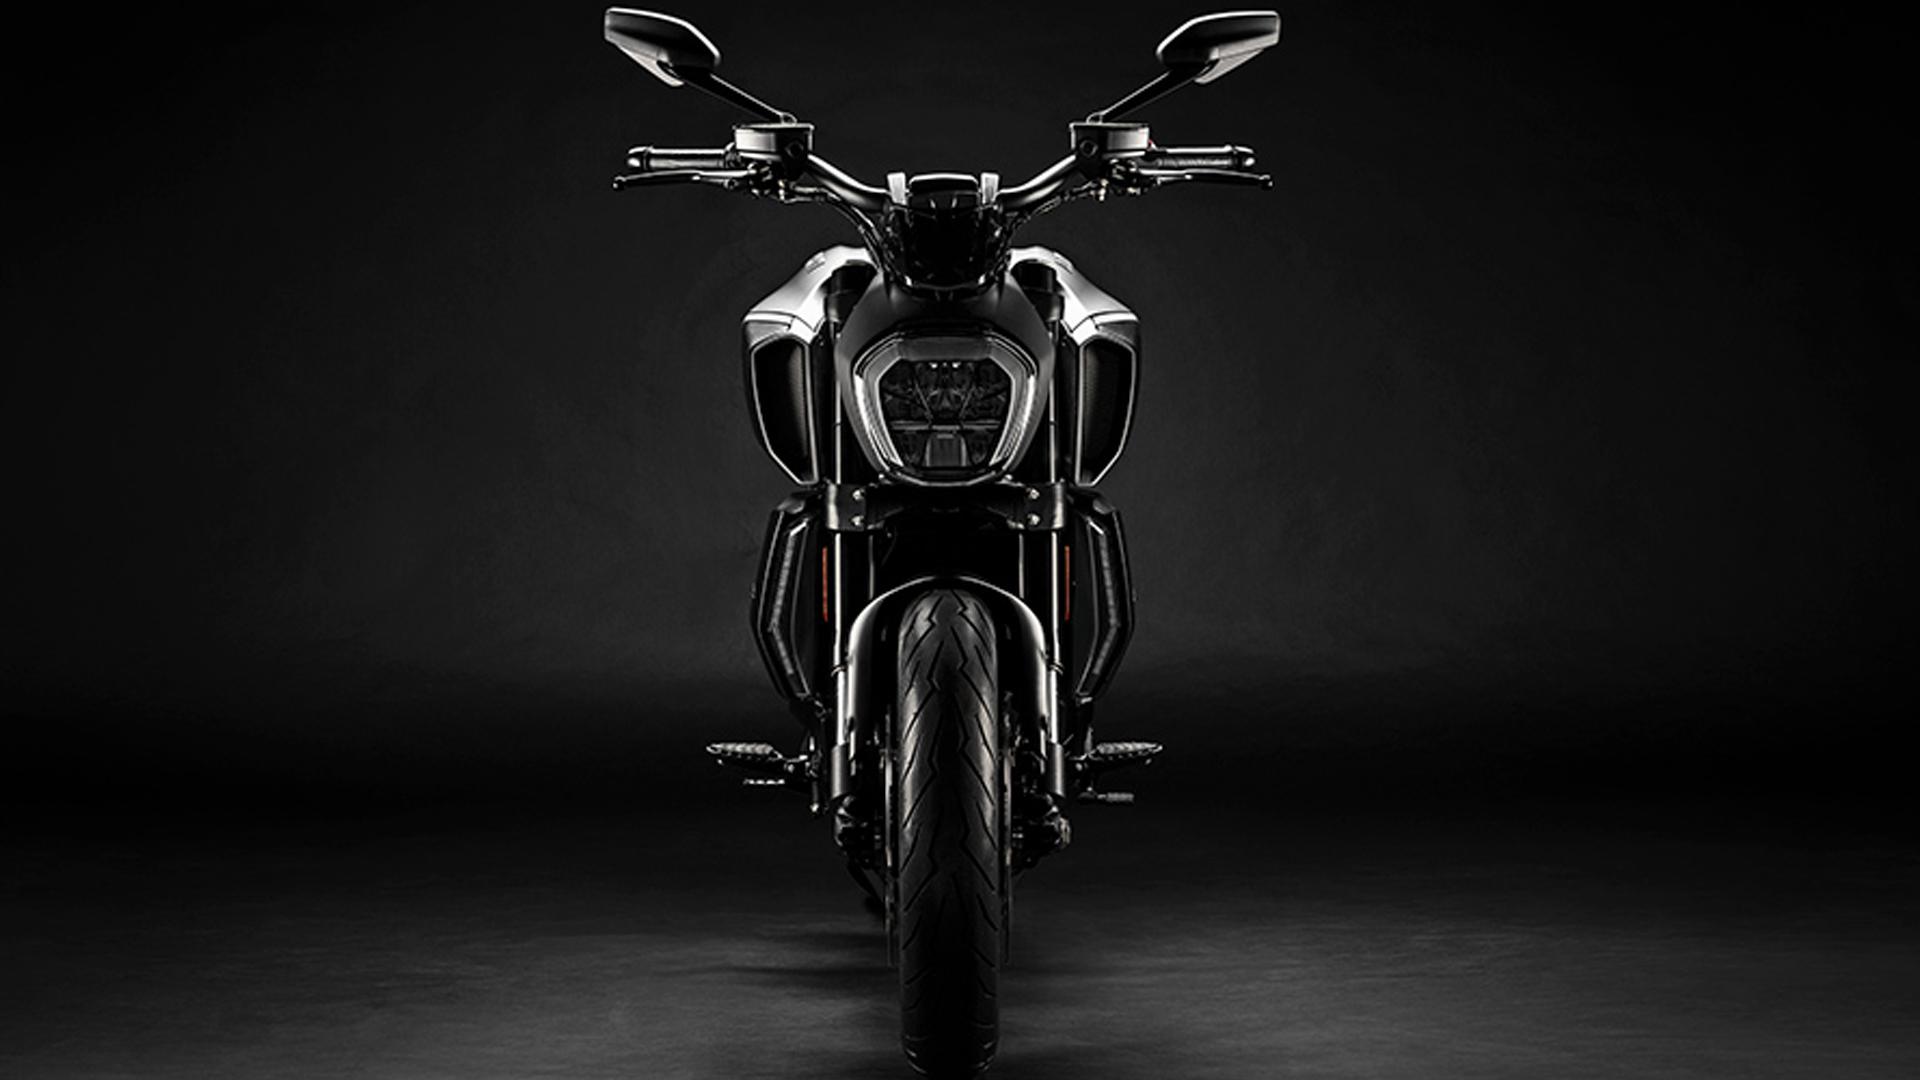 Ducati Diavel 1260 2021 S